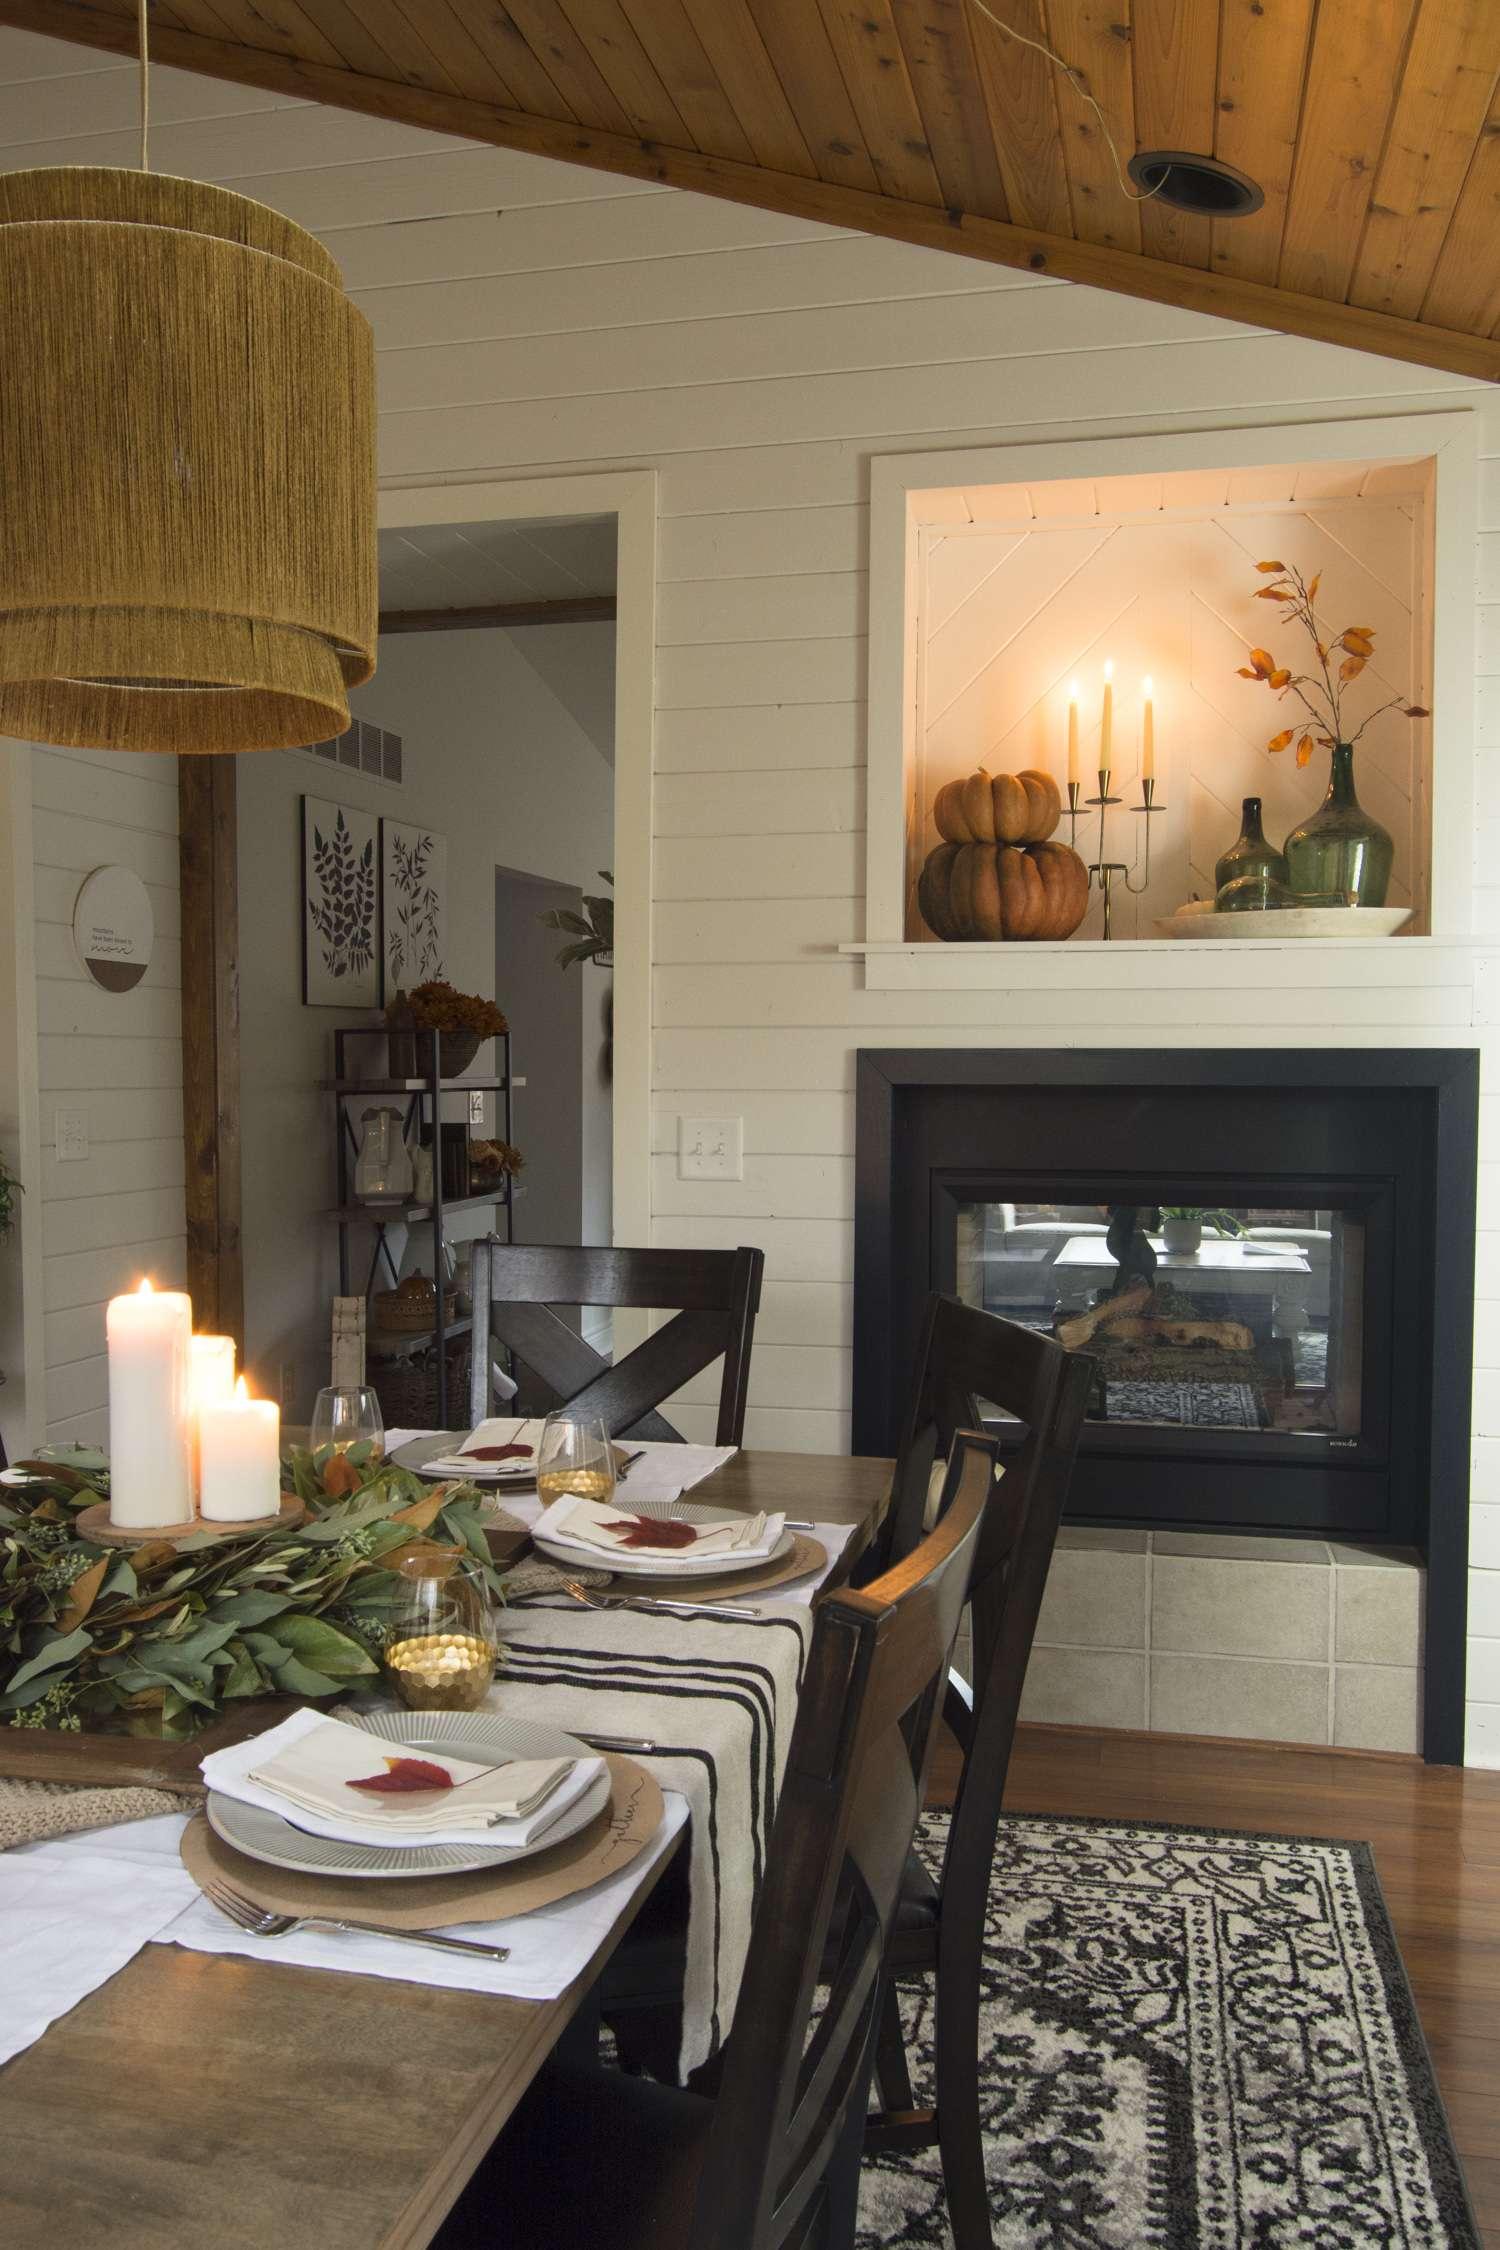 Thanksgiving centerpiece idea with fall decor.